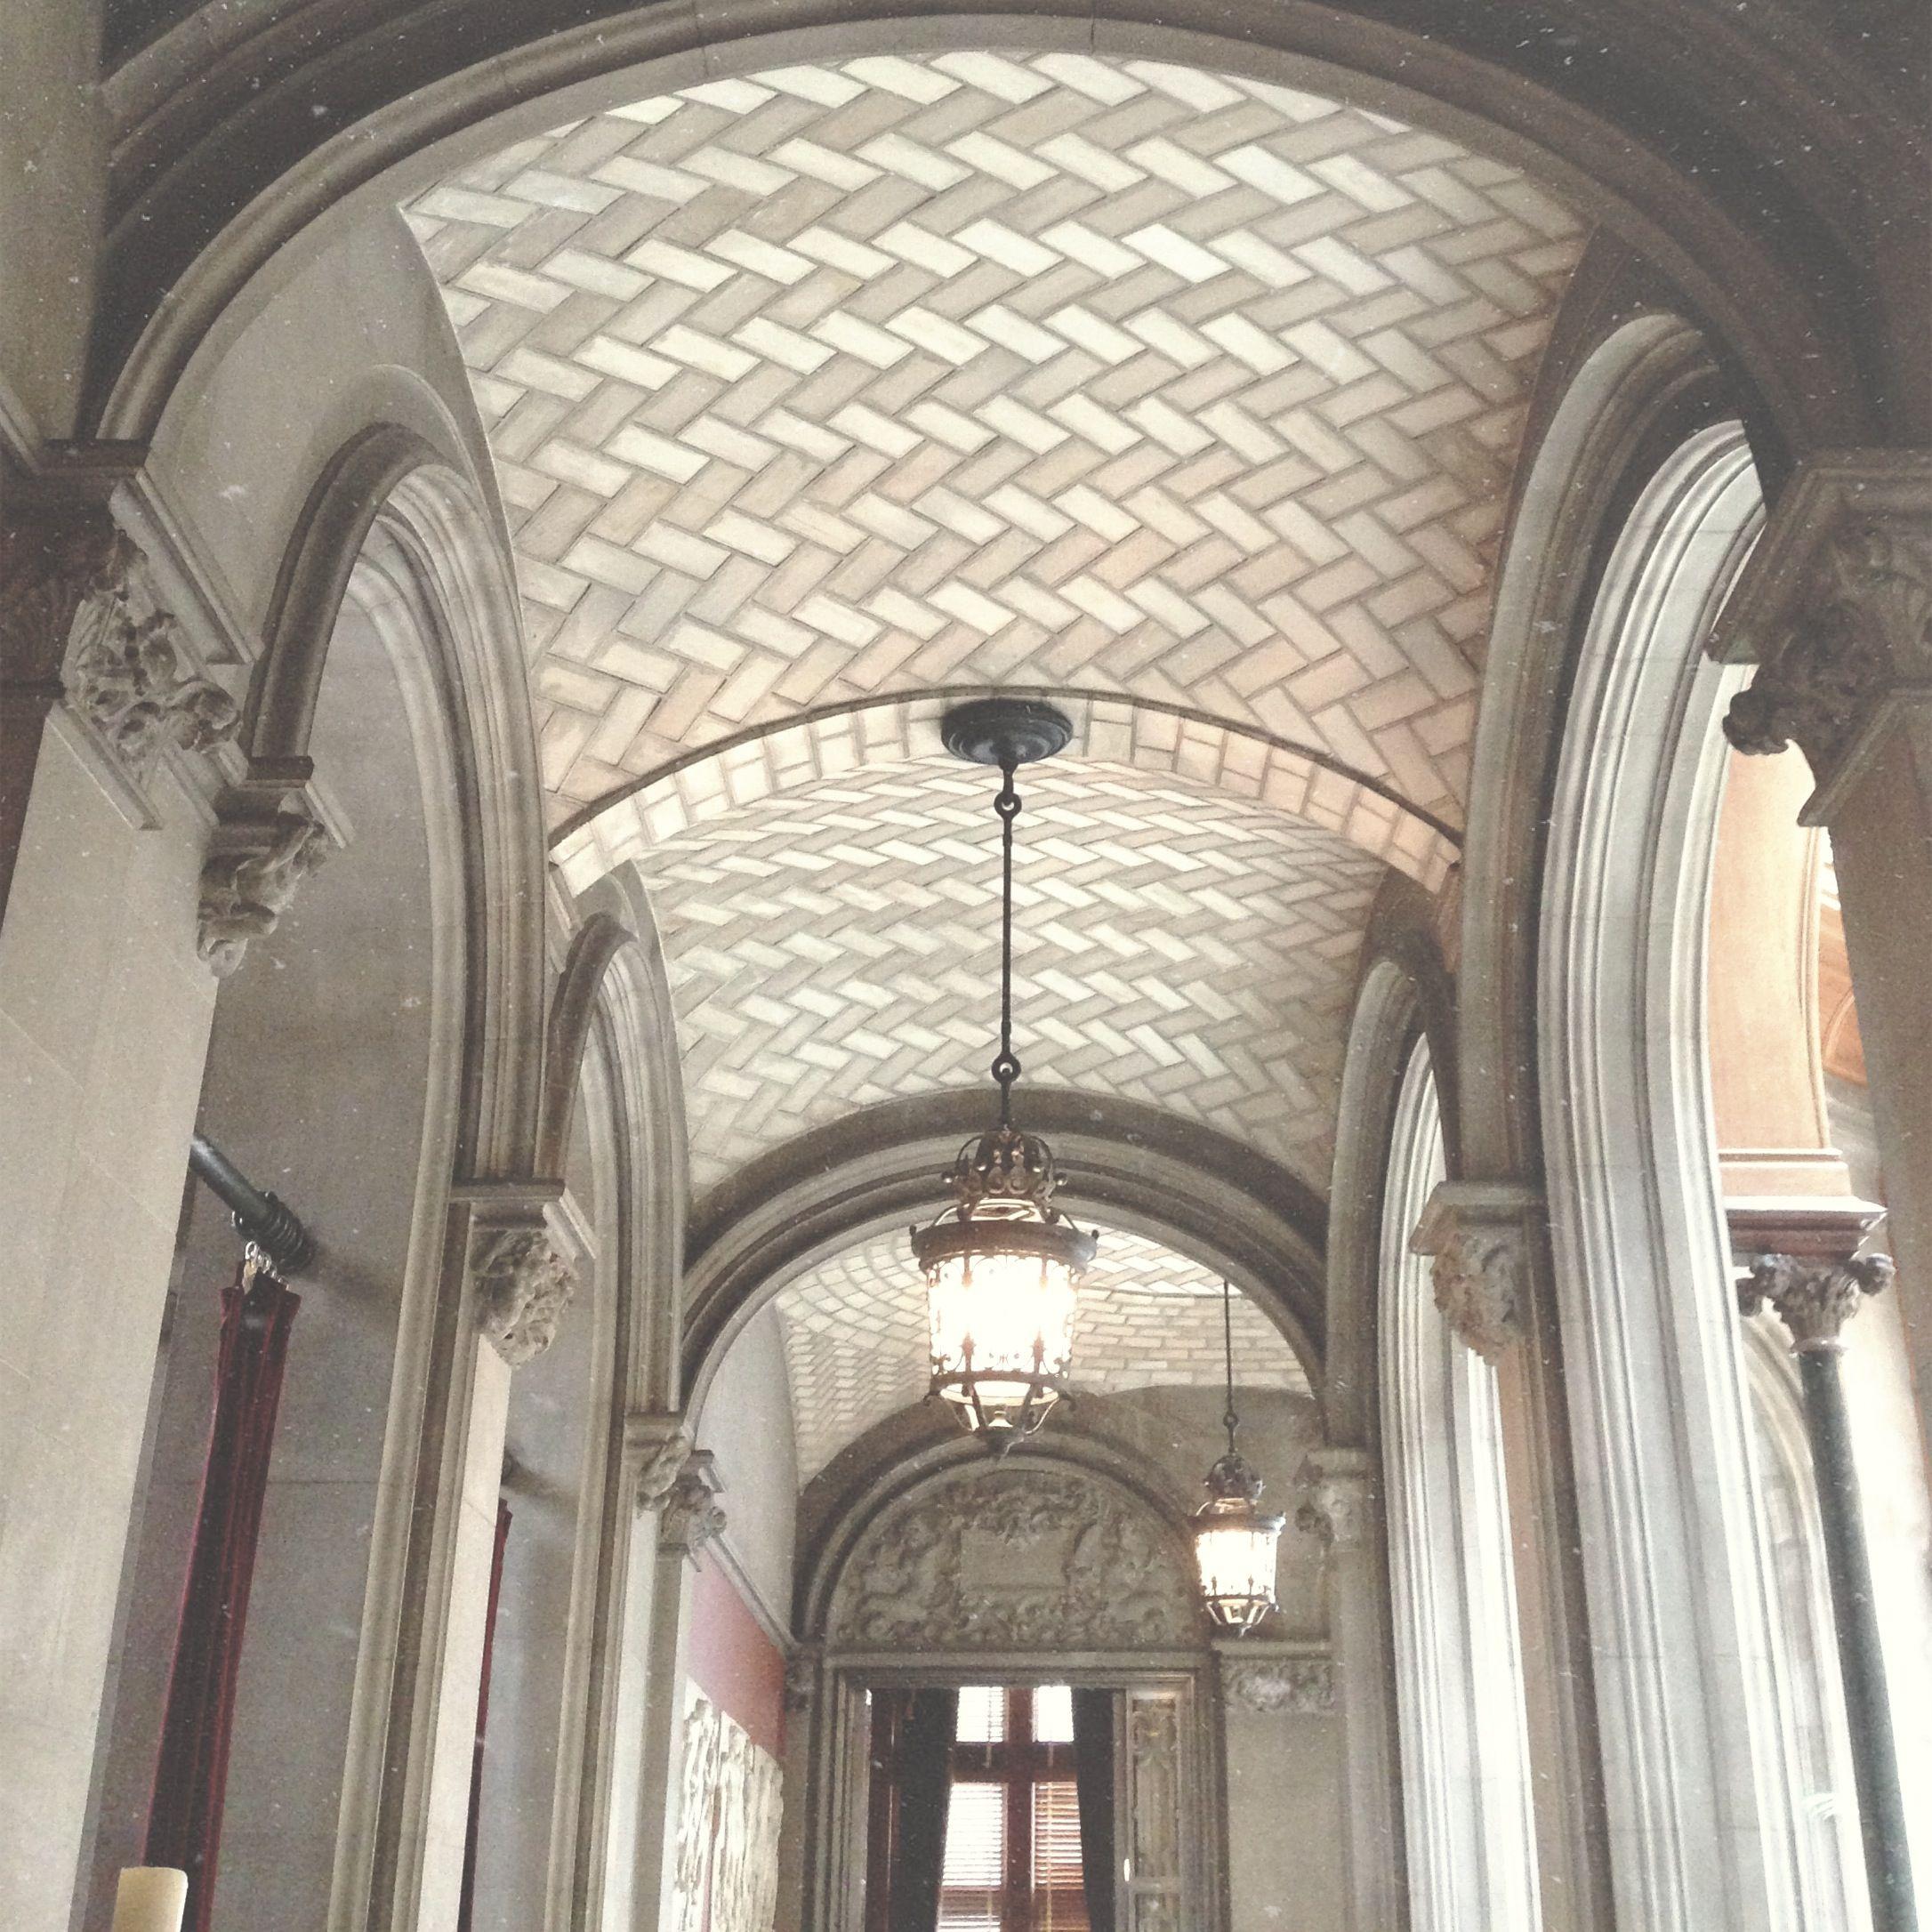 Biltmore Estate - Tile Work Ceilings Of